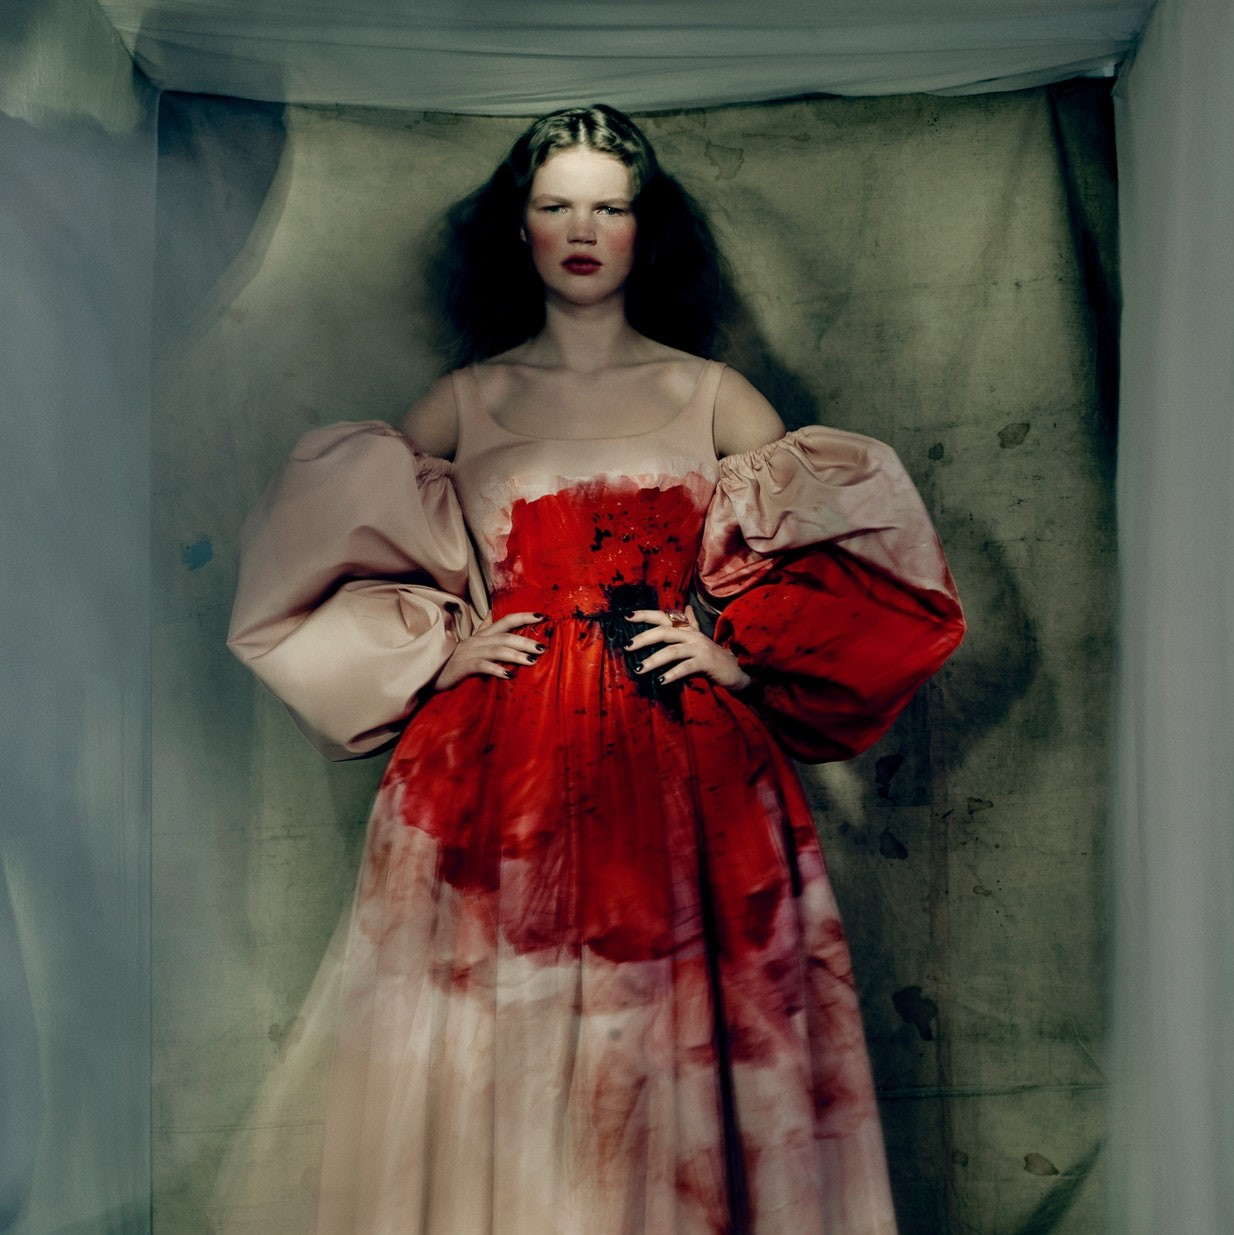 Crystals - promo - Coming Soon: Alexander McQueen image